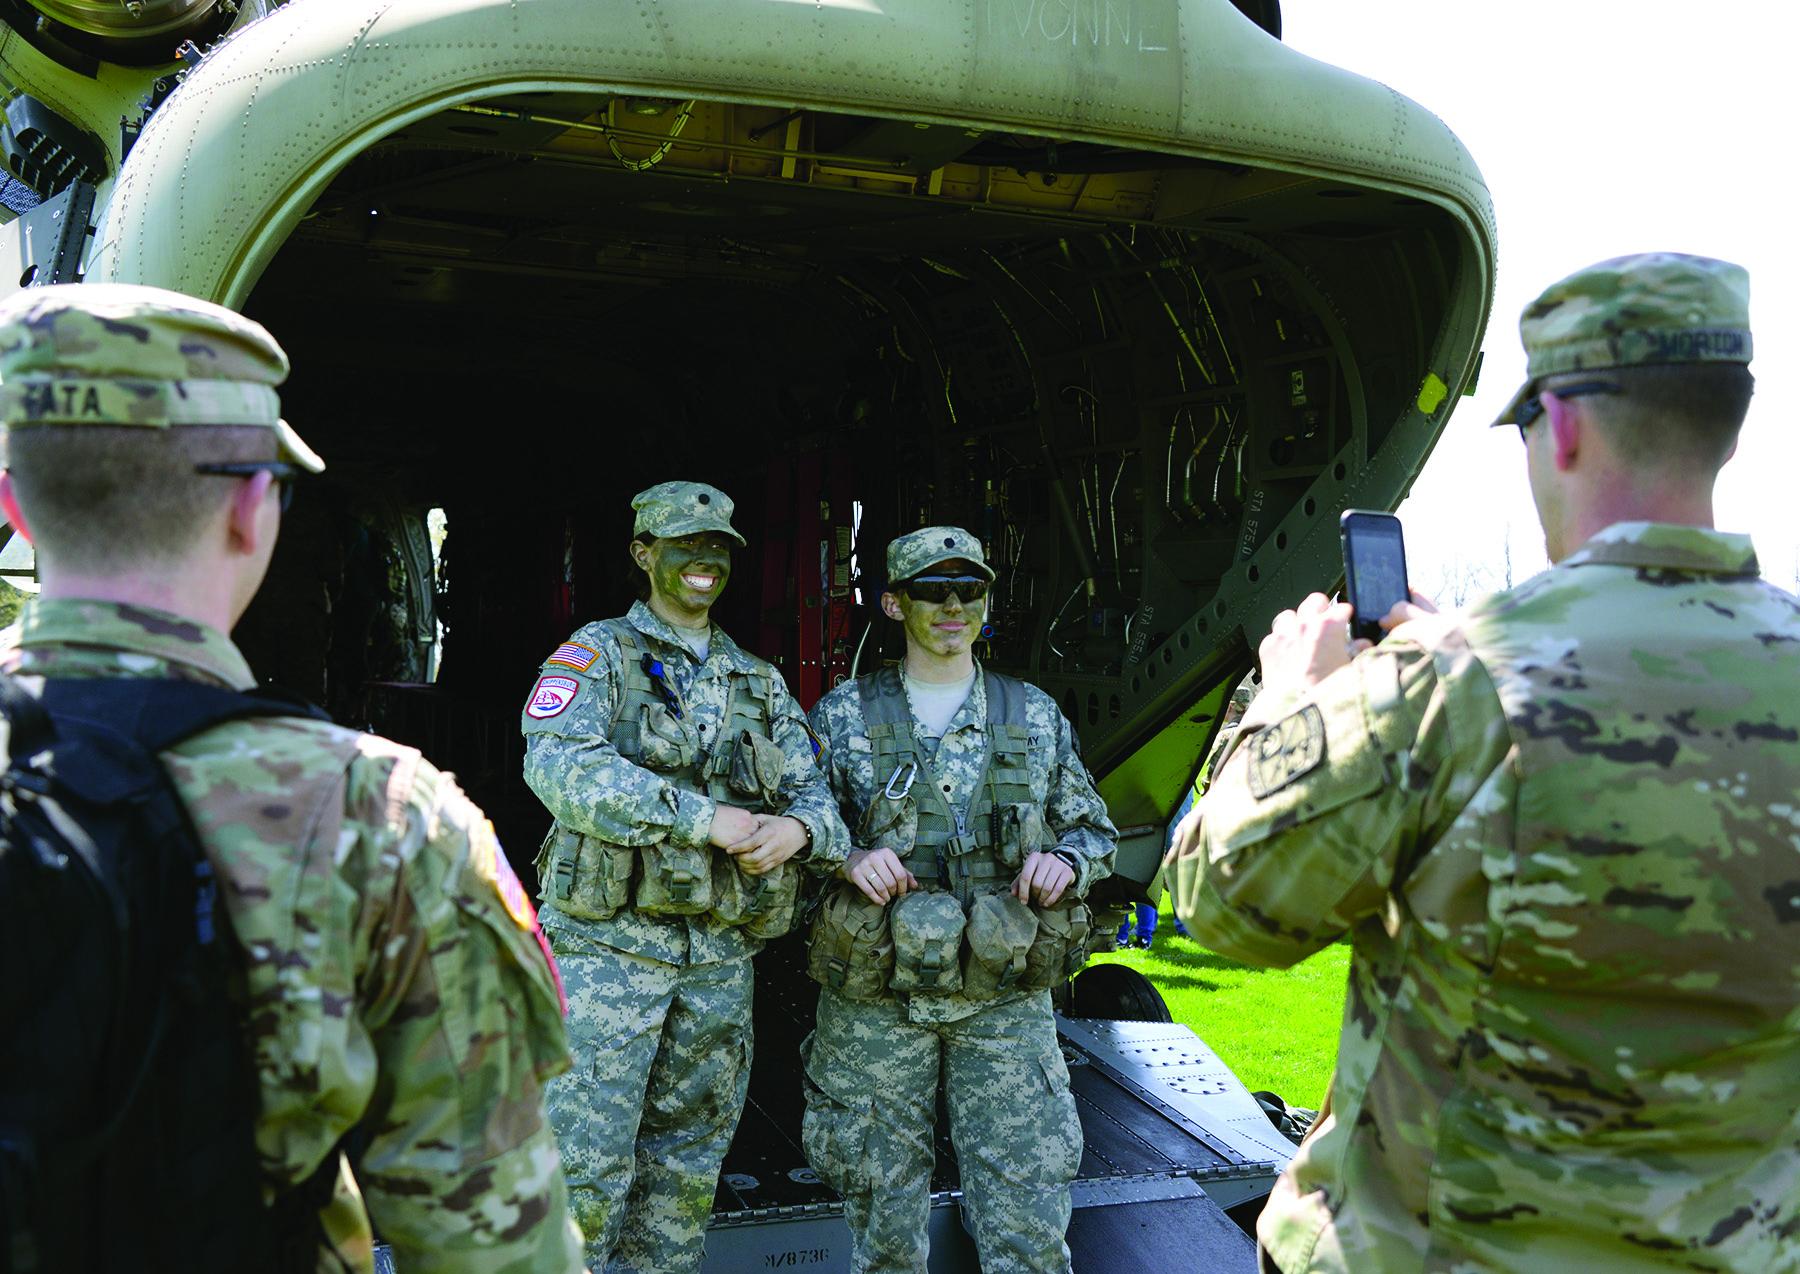 Chinook.Tour.ROTC.cadets.cmyk.420.jpg